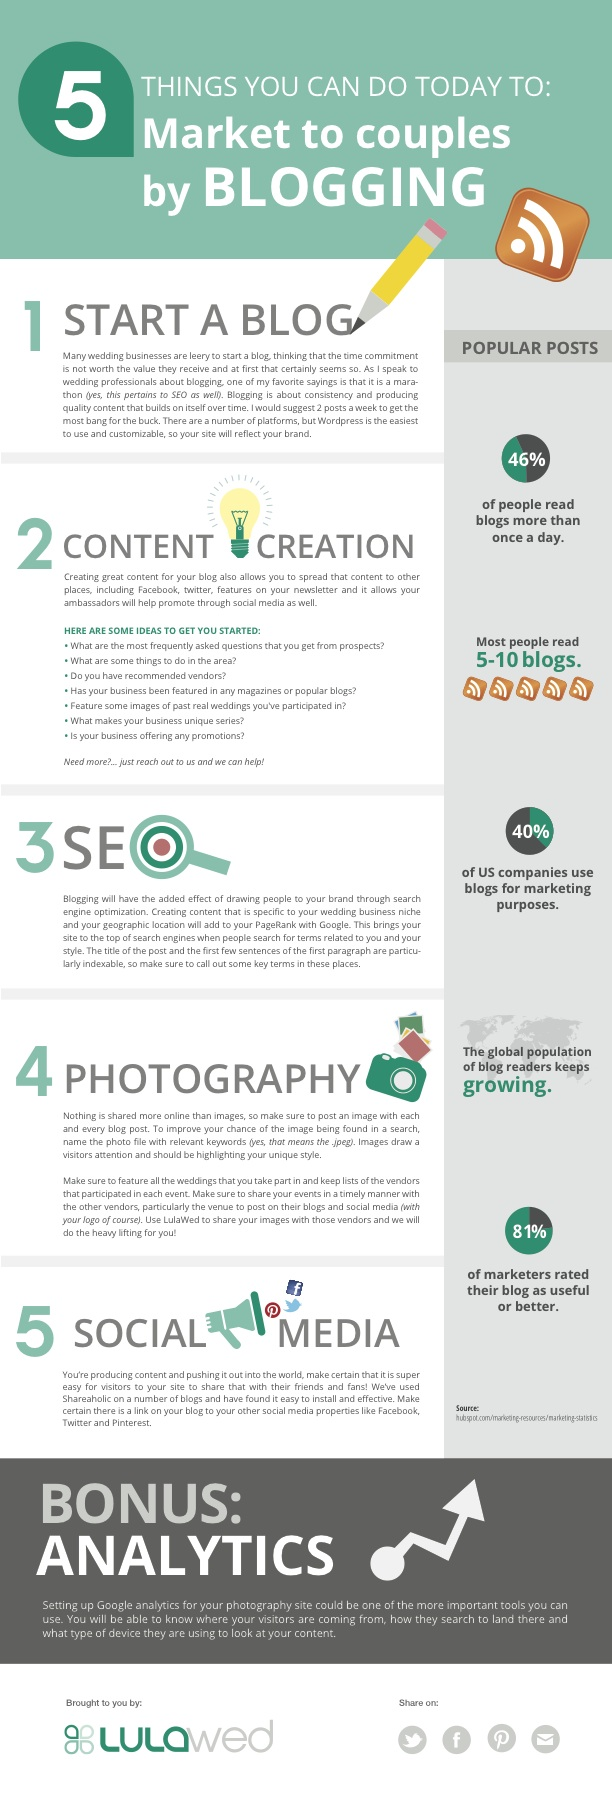 marketing-wedding-photography-business-infographic